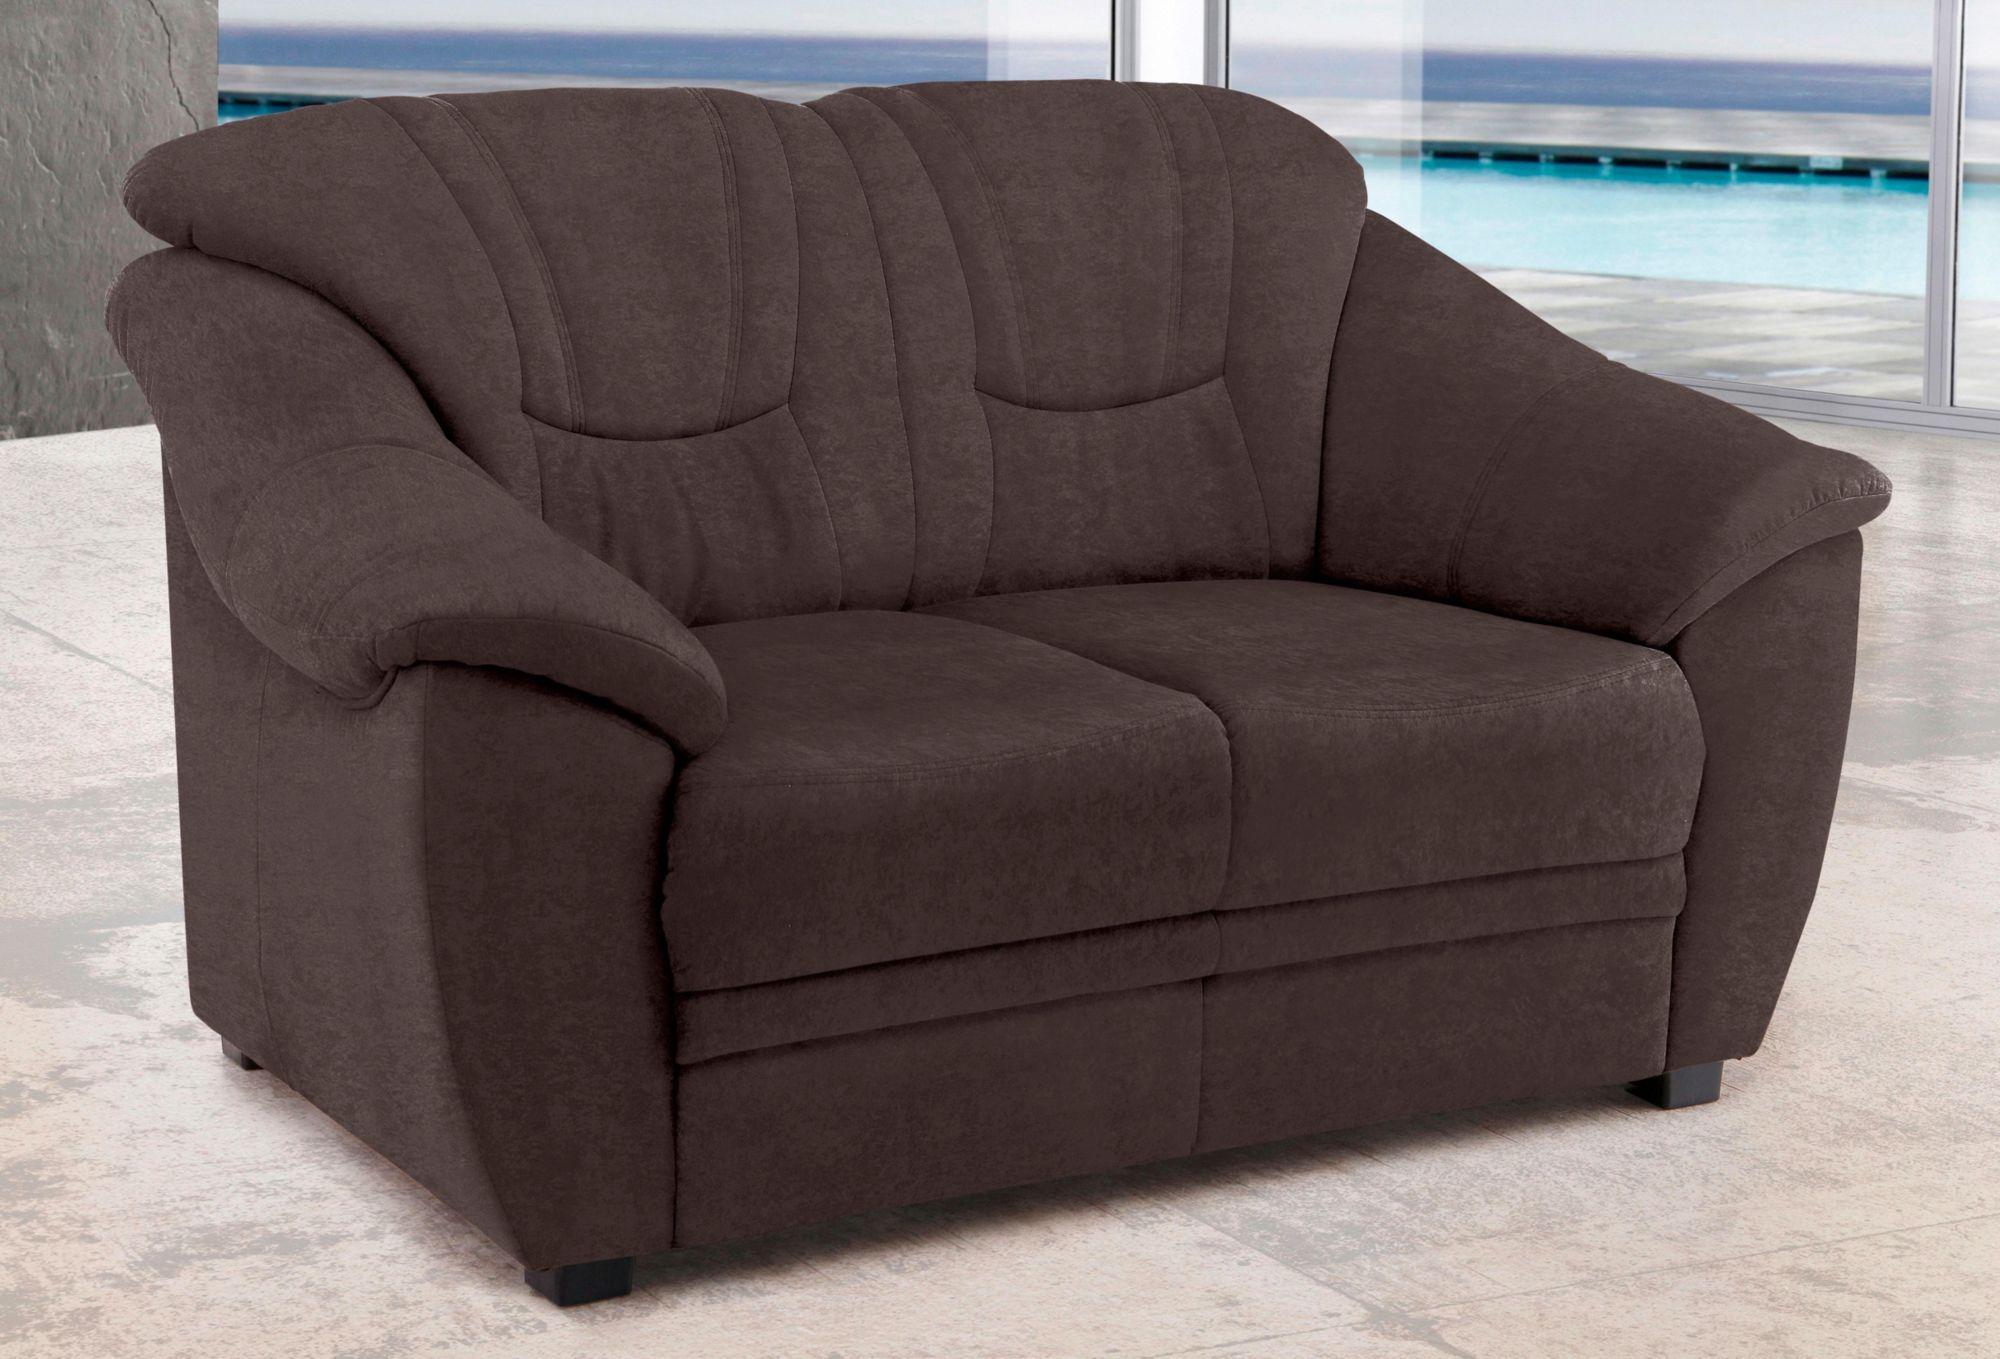 SITMORE 2-Sitzer, Sit & More